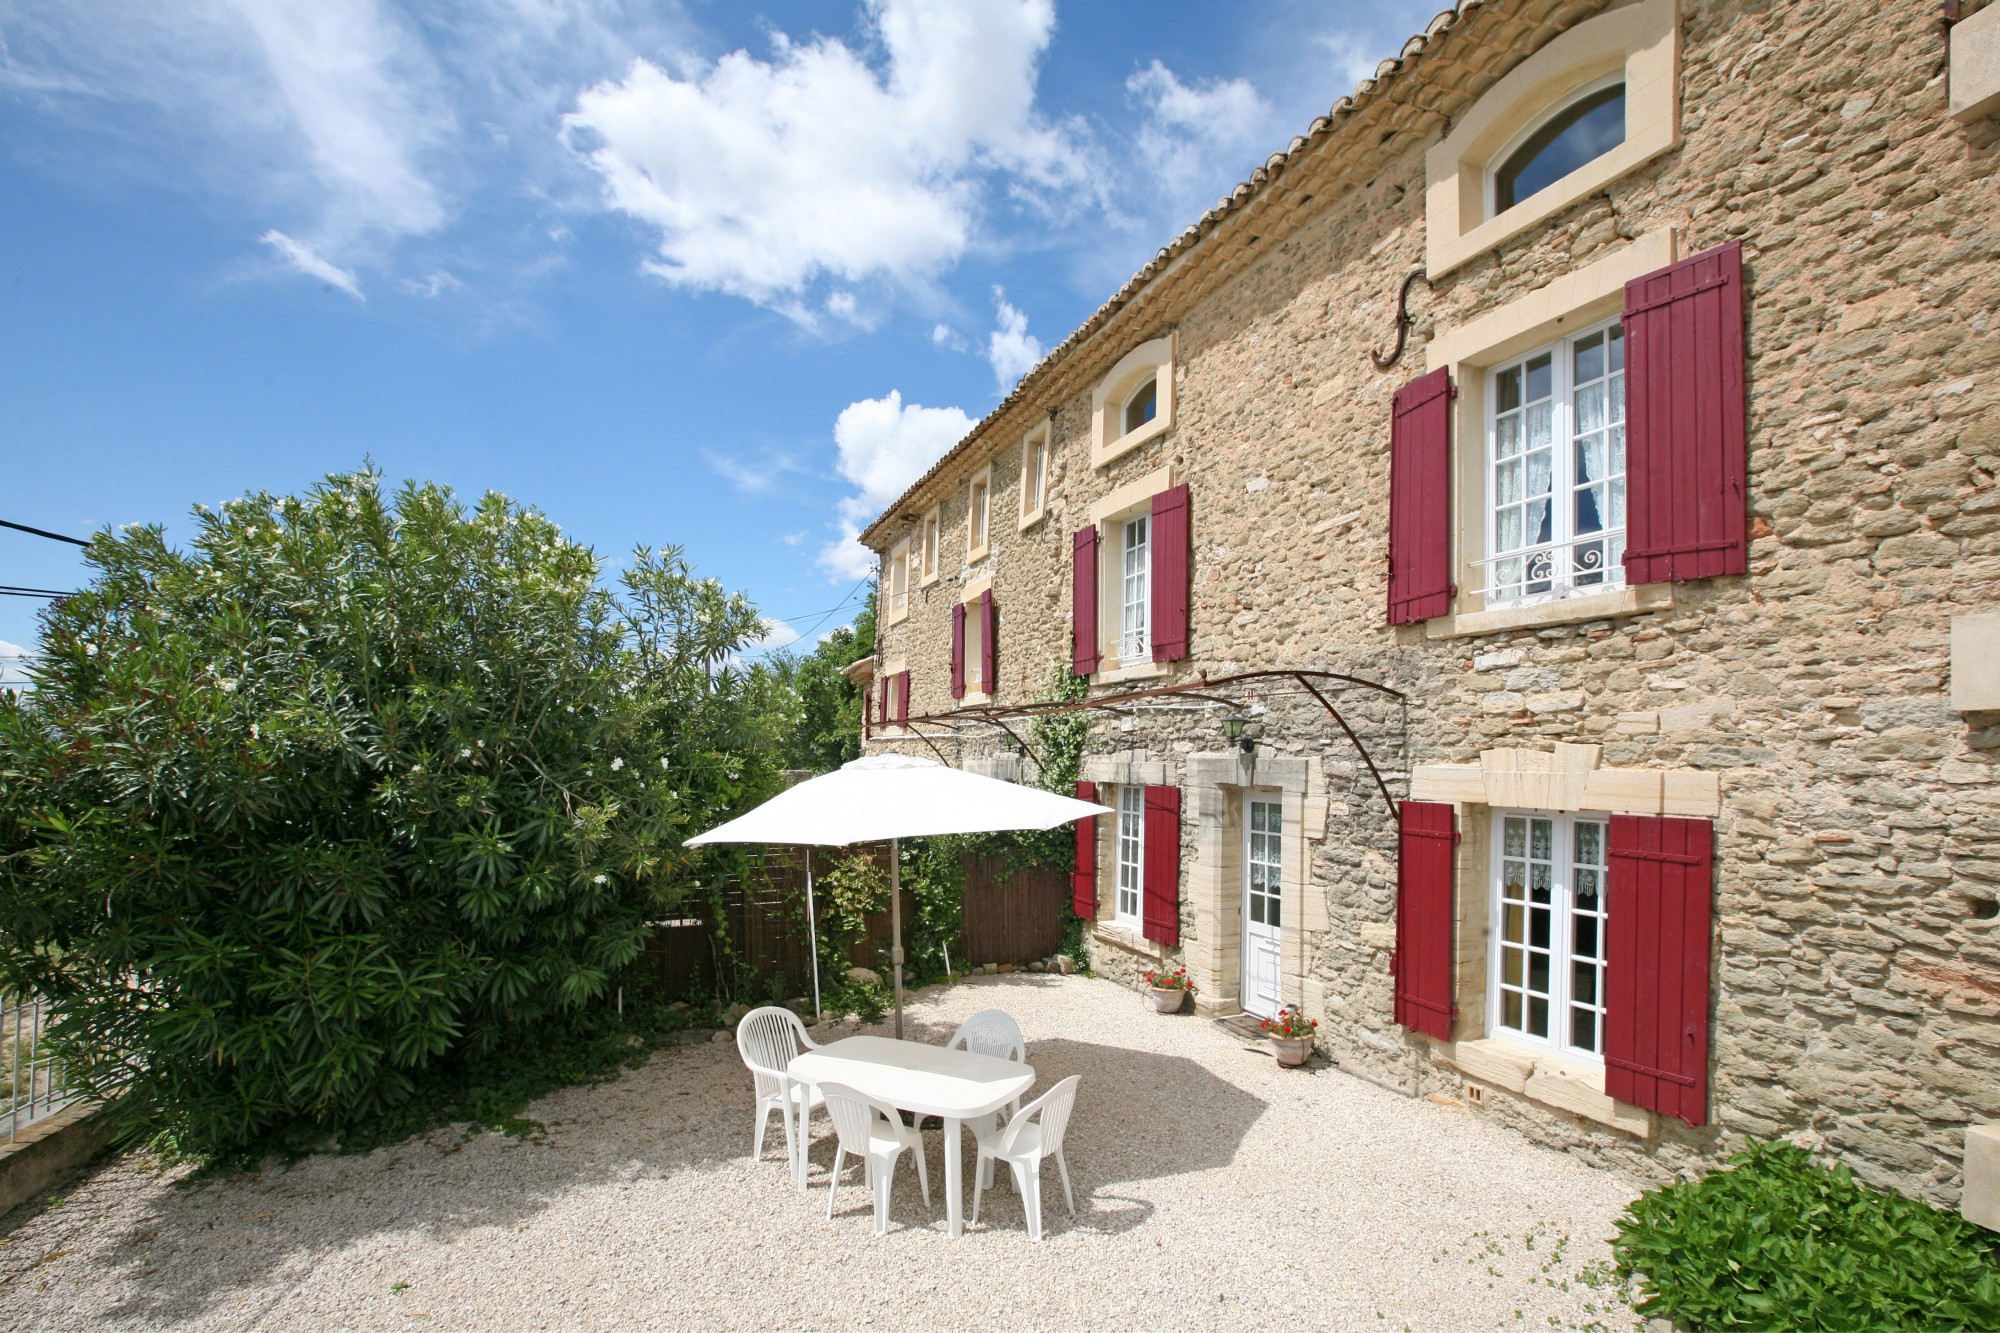 En vente en Provence, belle maison de famille avec gites, jardin et piscine